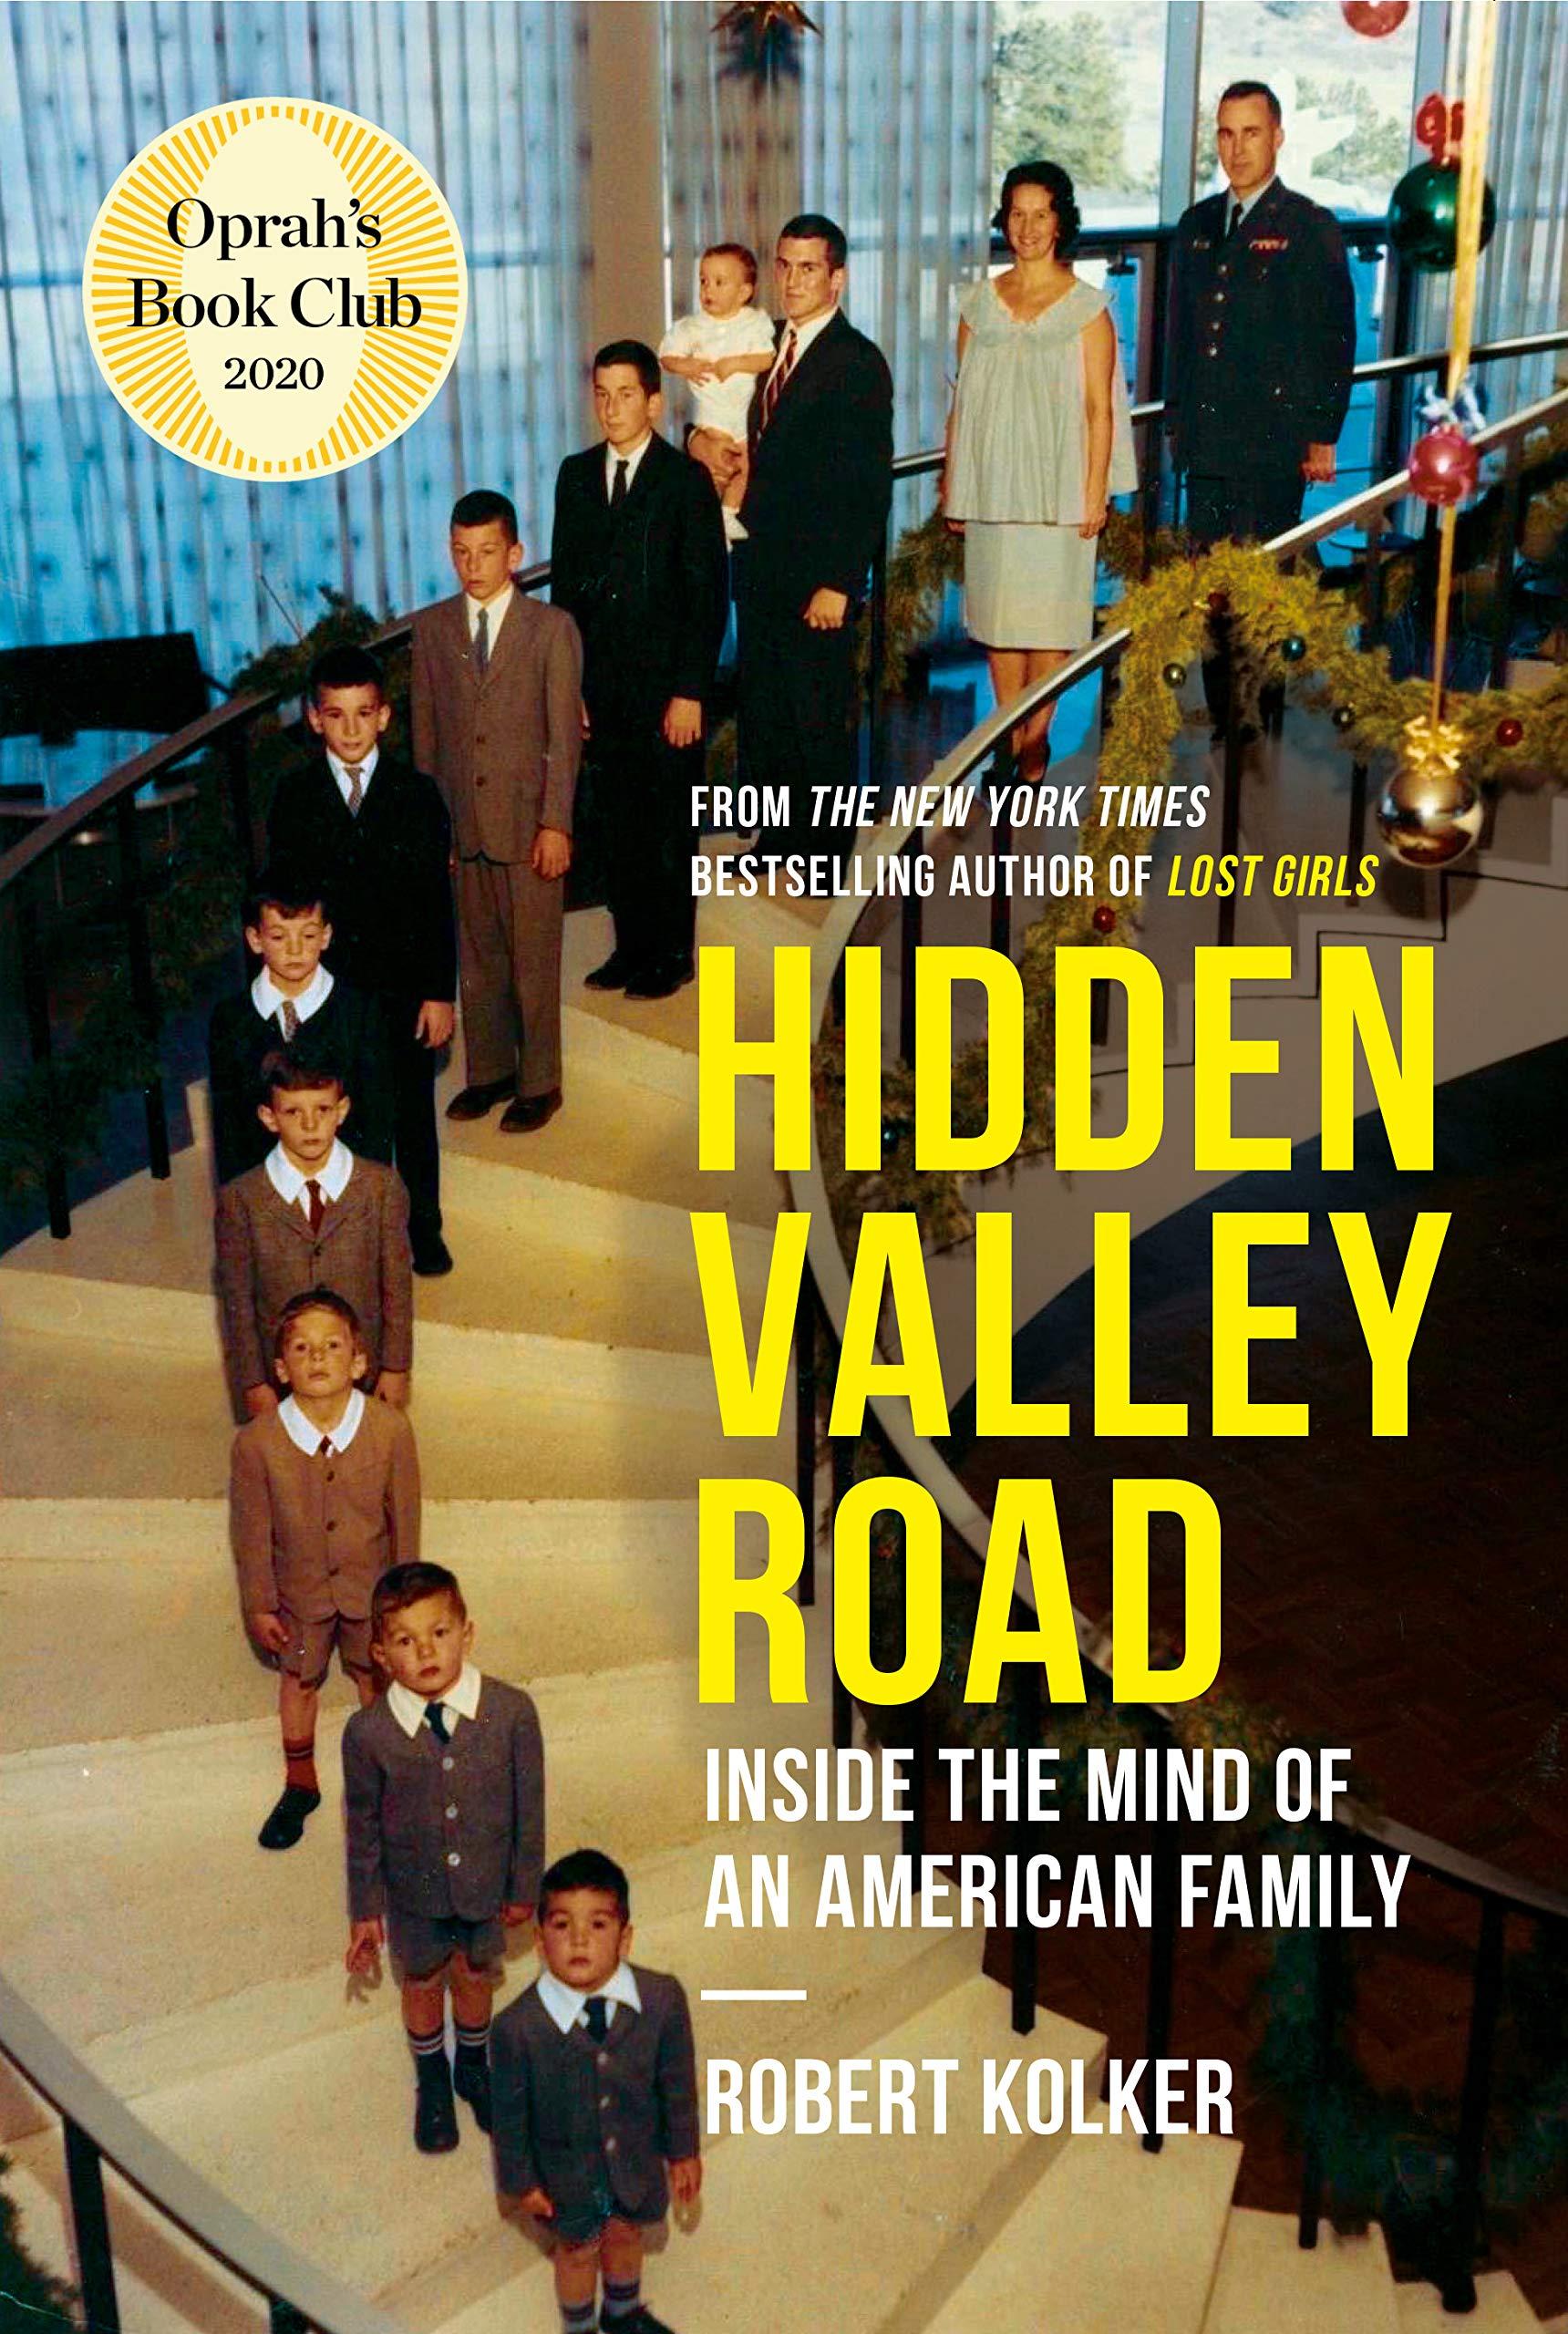 Hidden Valley Road: Inside the Mind of an American Family: Kolker, Robert:  9780735274457: Books - Amazon.ca